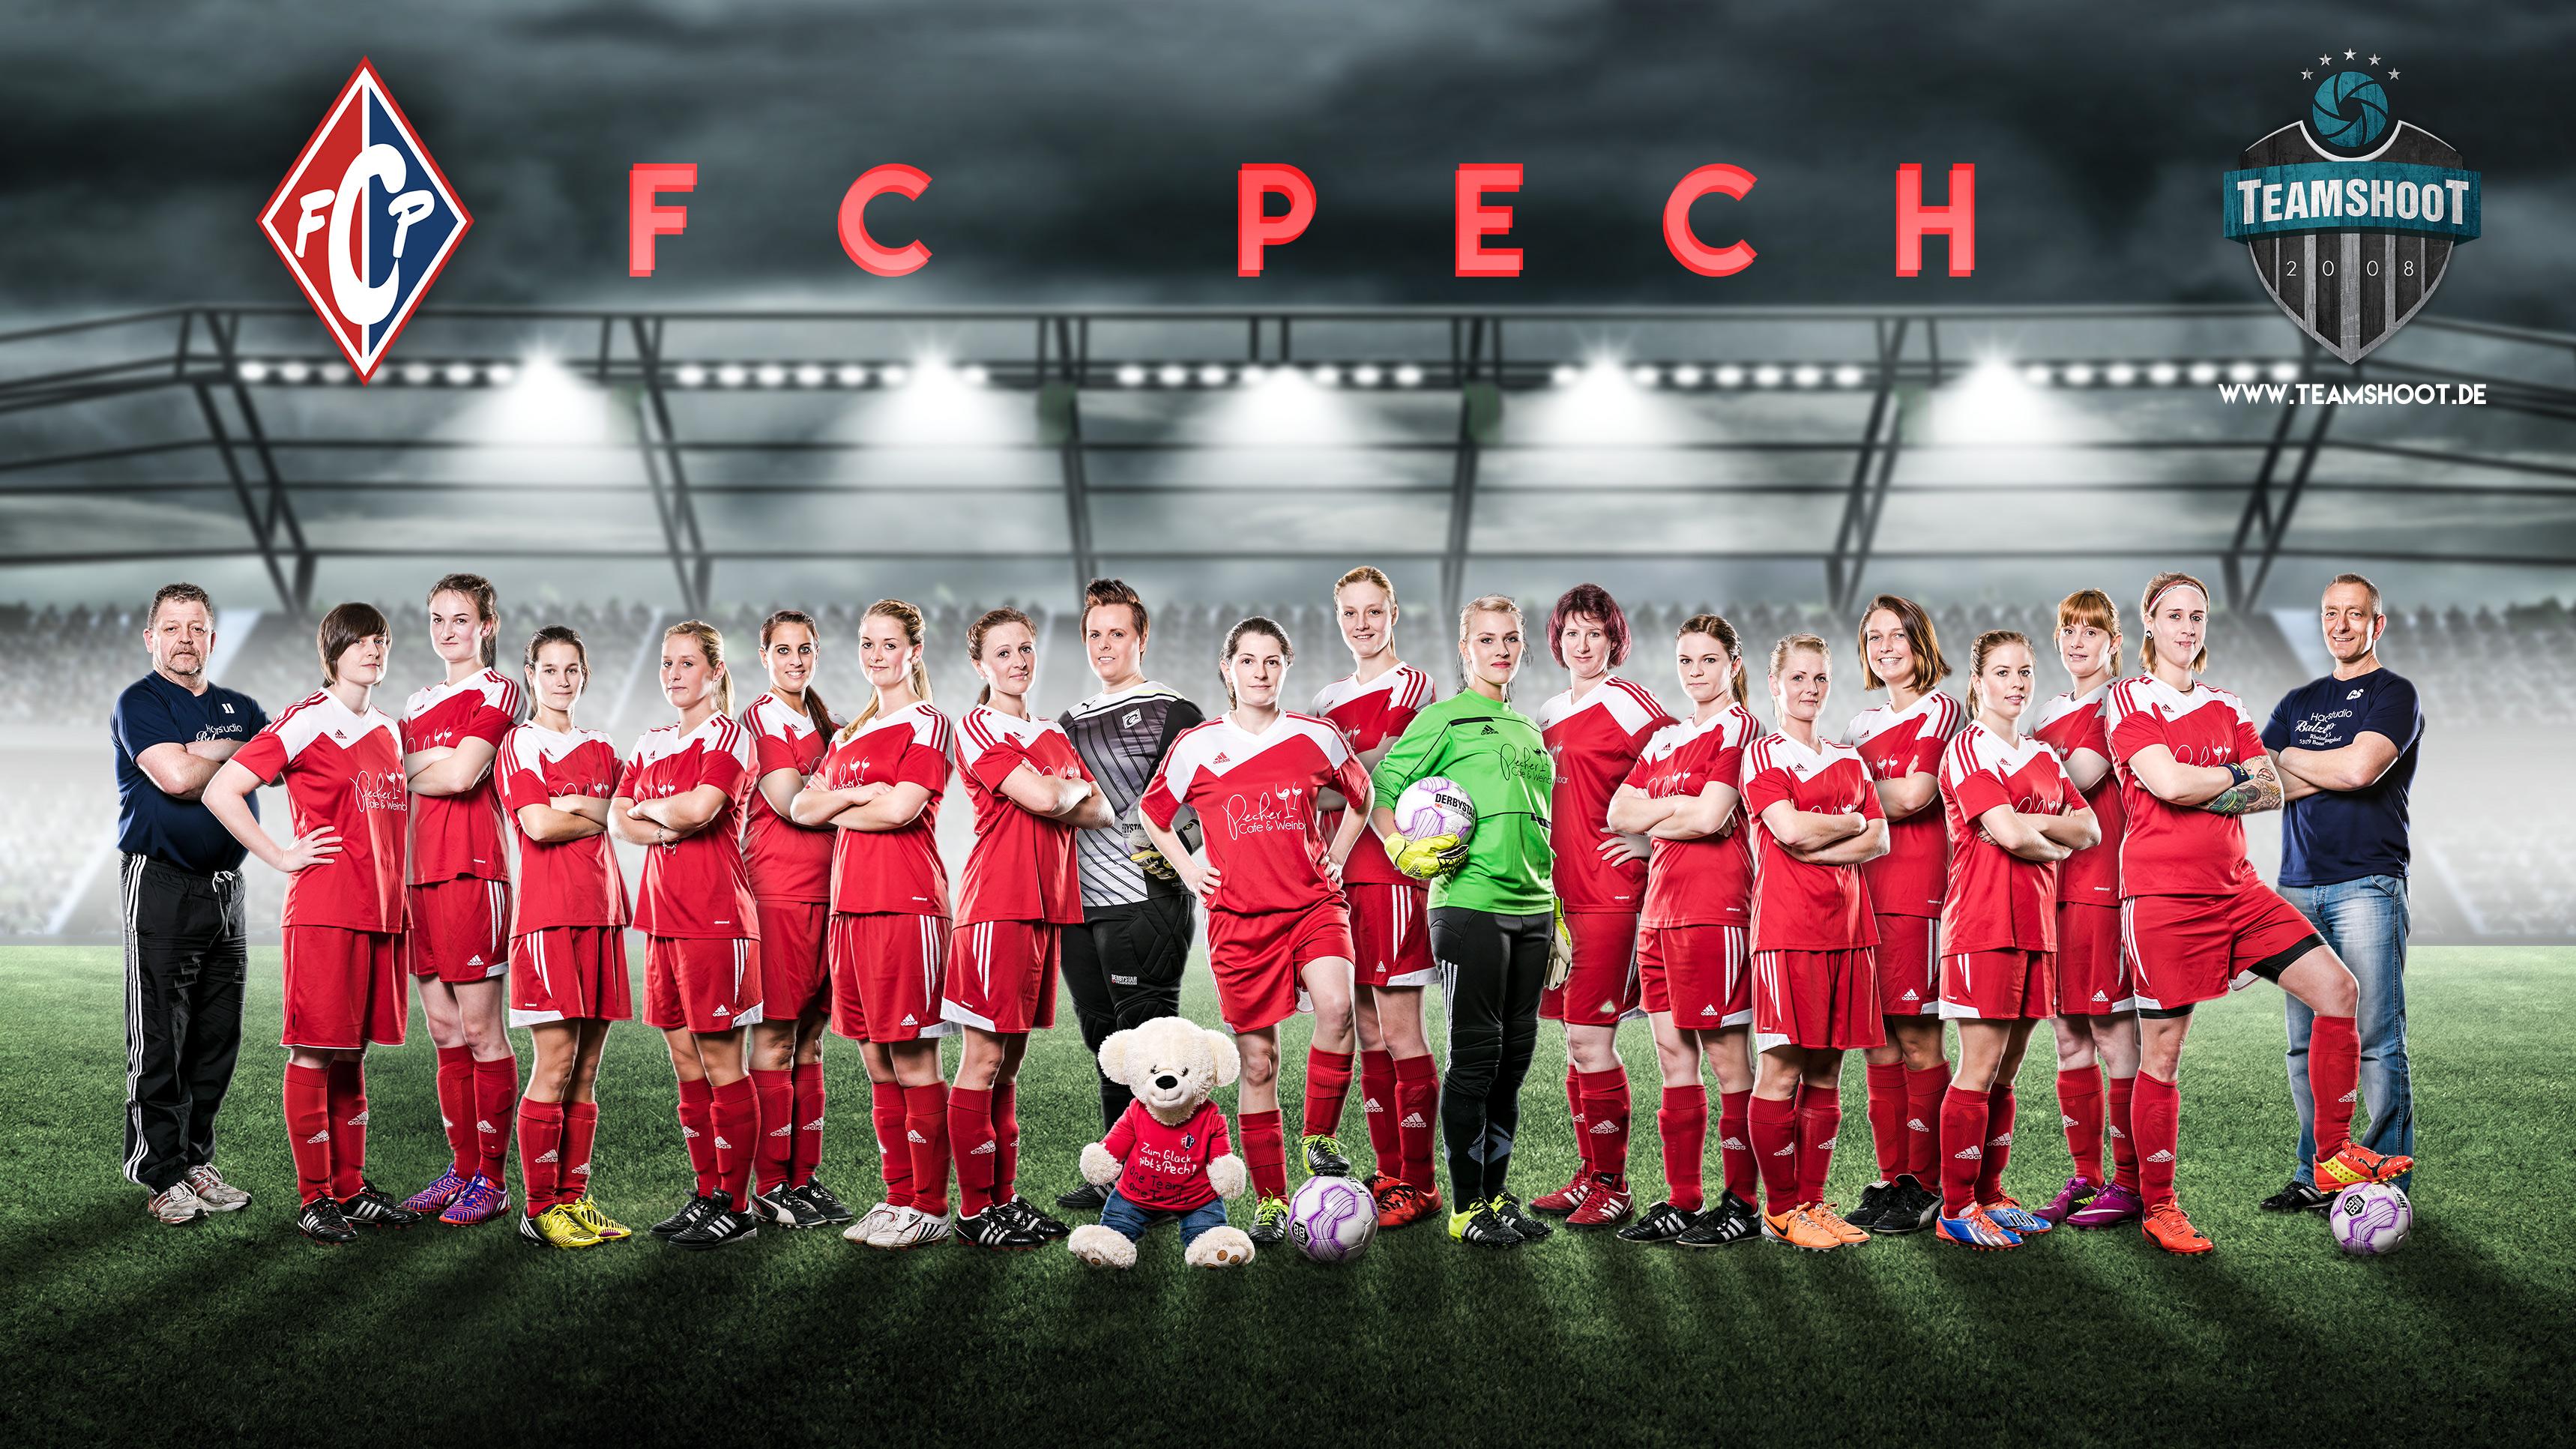 Frauenfußball cooles Mannschaftsfoto der Damen vom FC Pech bei Bonn